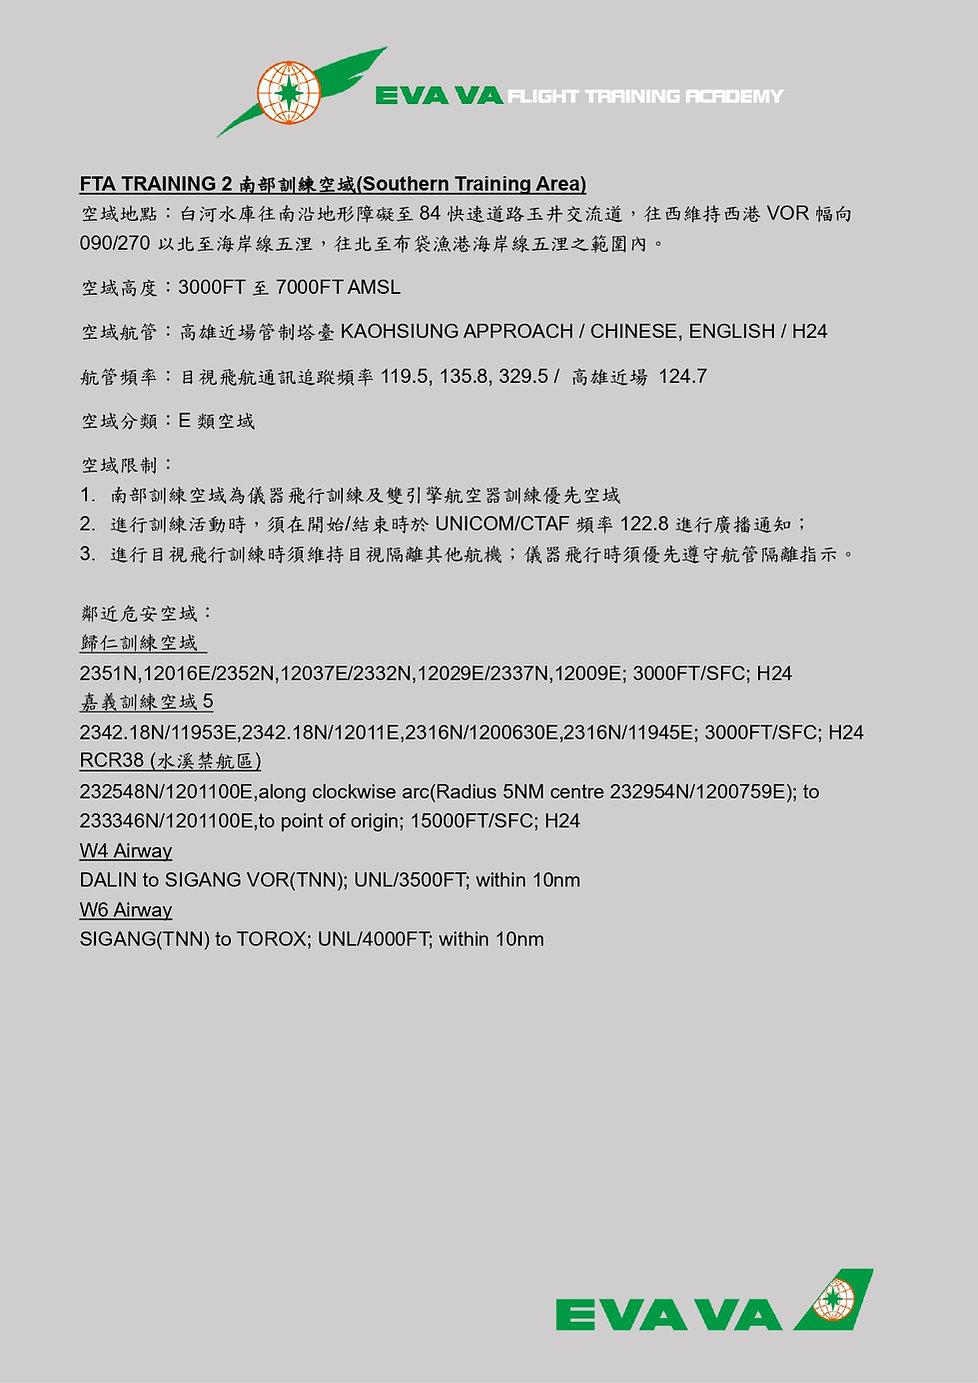 FTA TRAINING AREA V1.1_page-0003.jpg